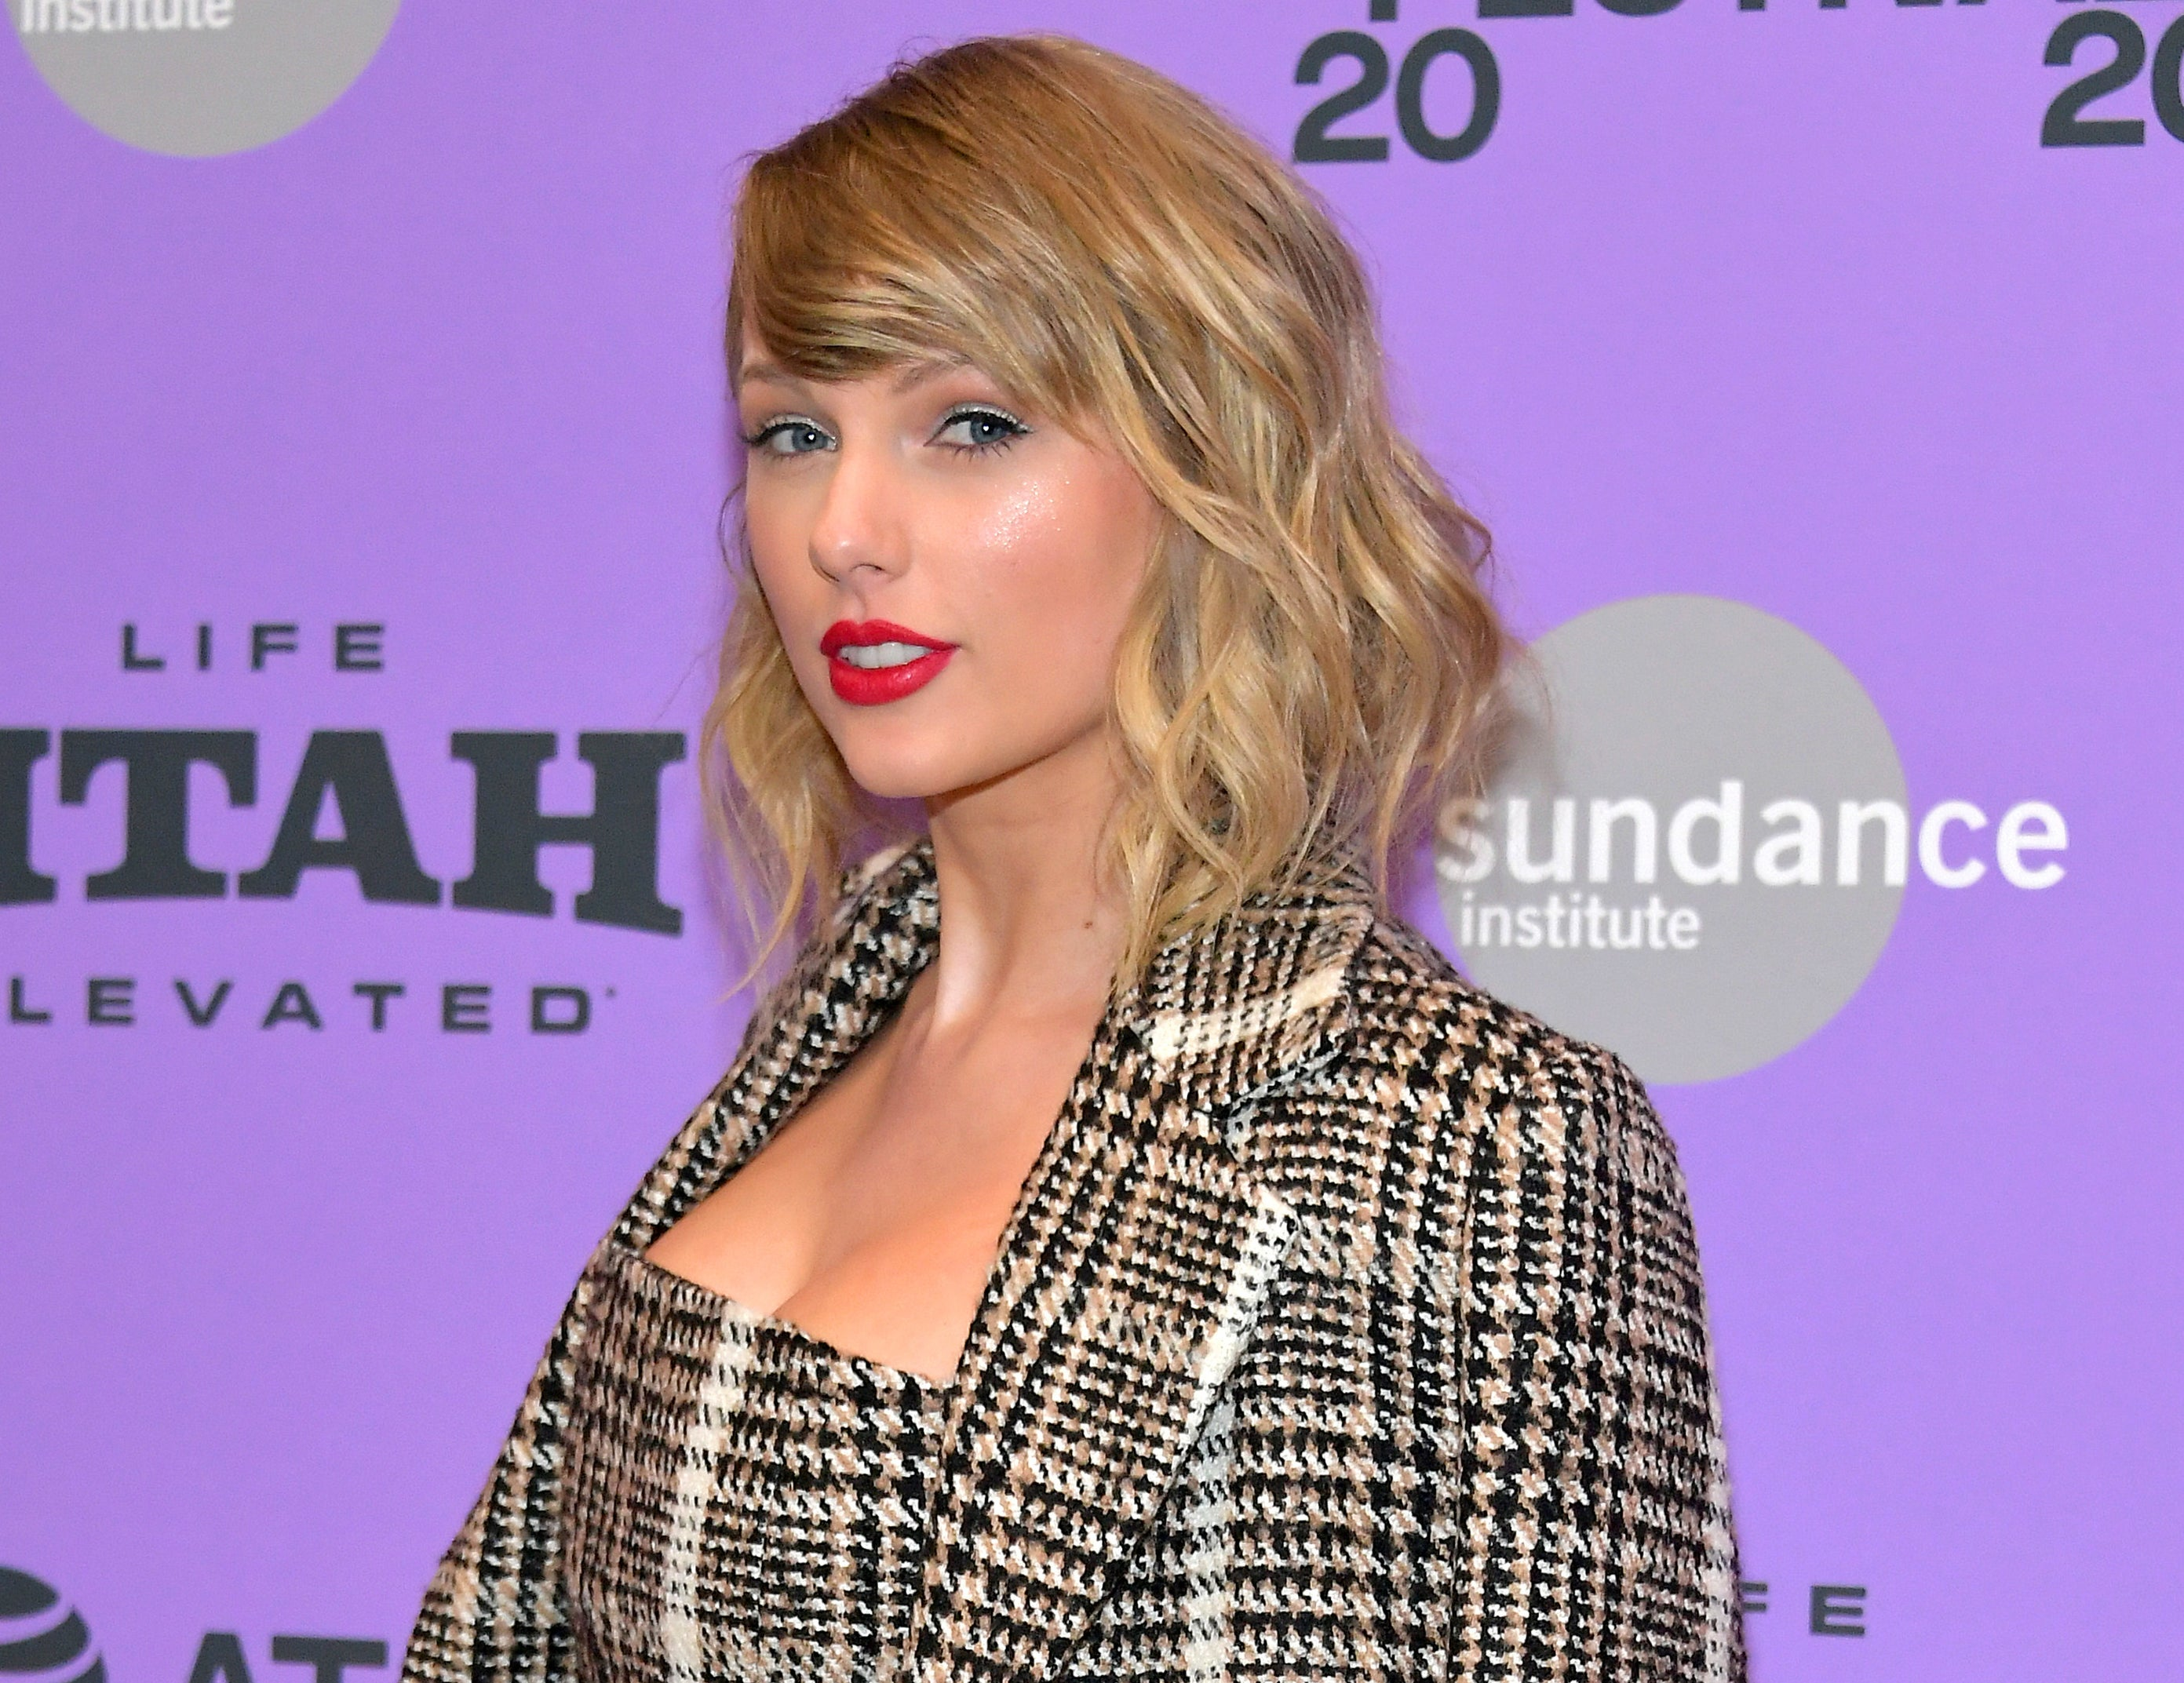 Taylor wears a tweed blazer to a documentary premiere